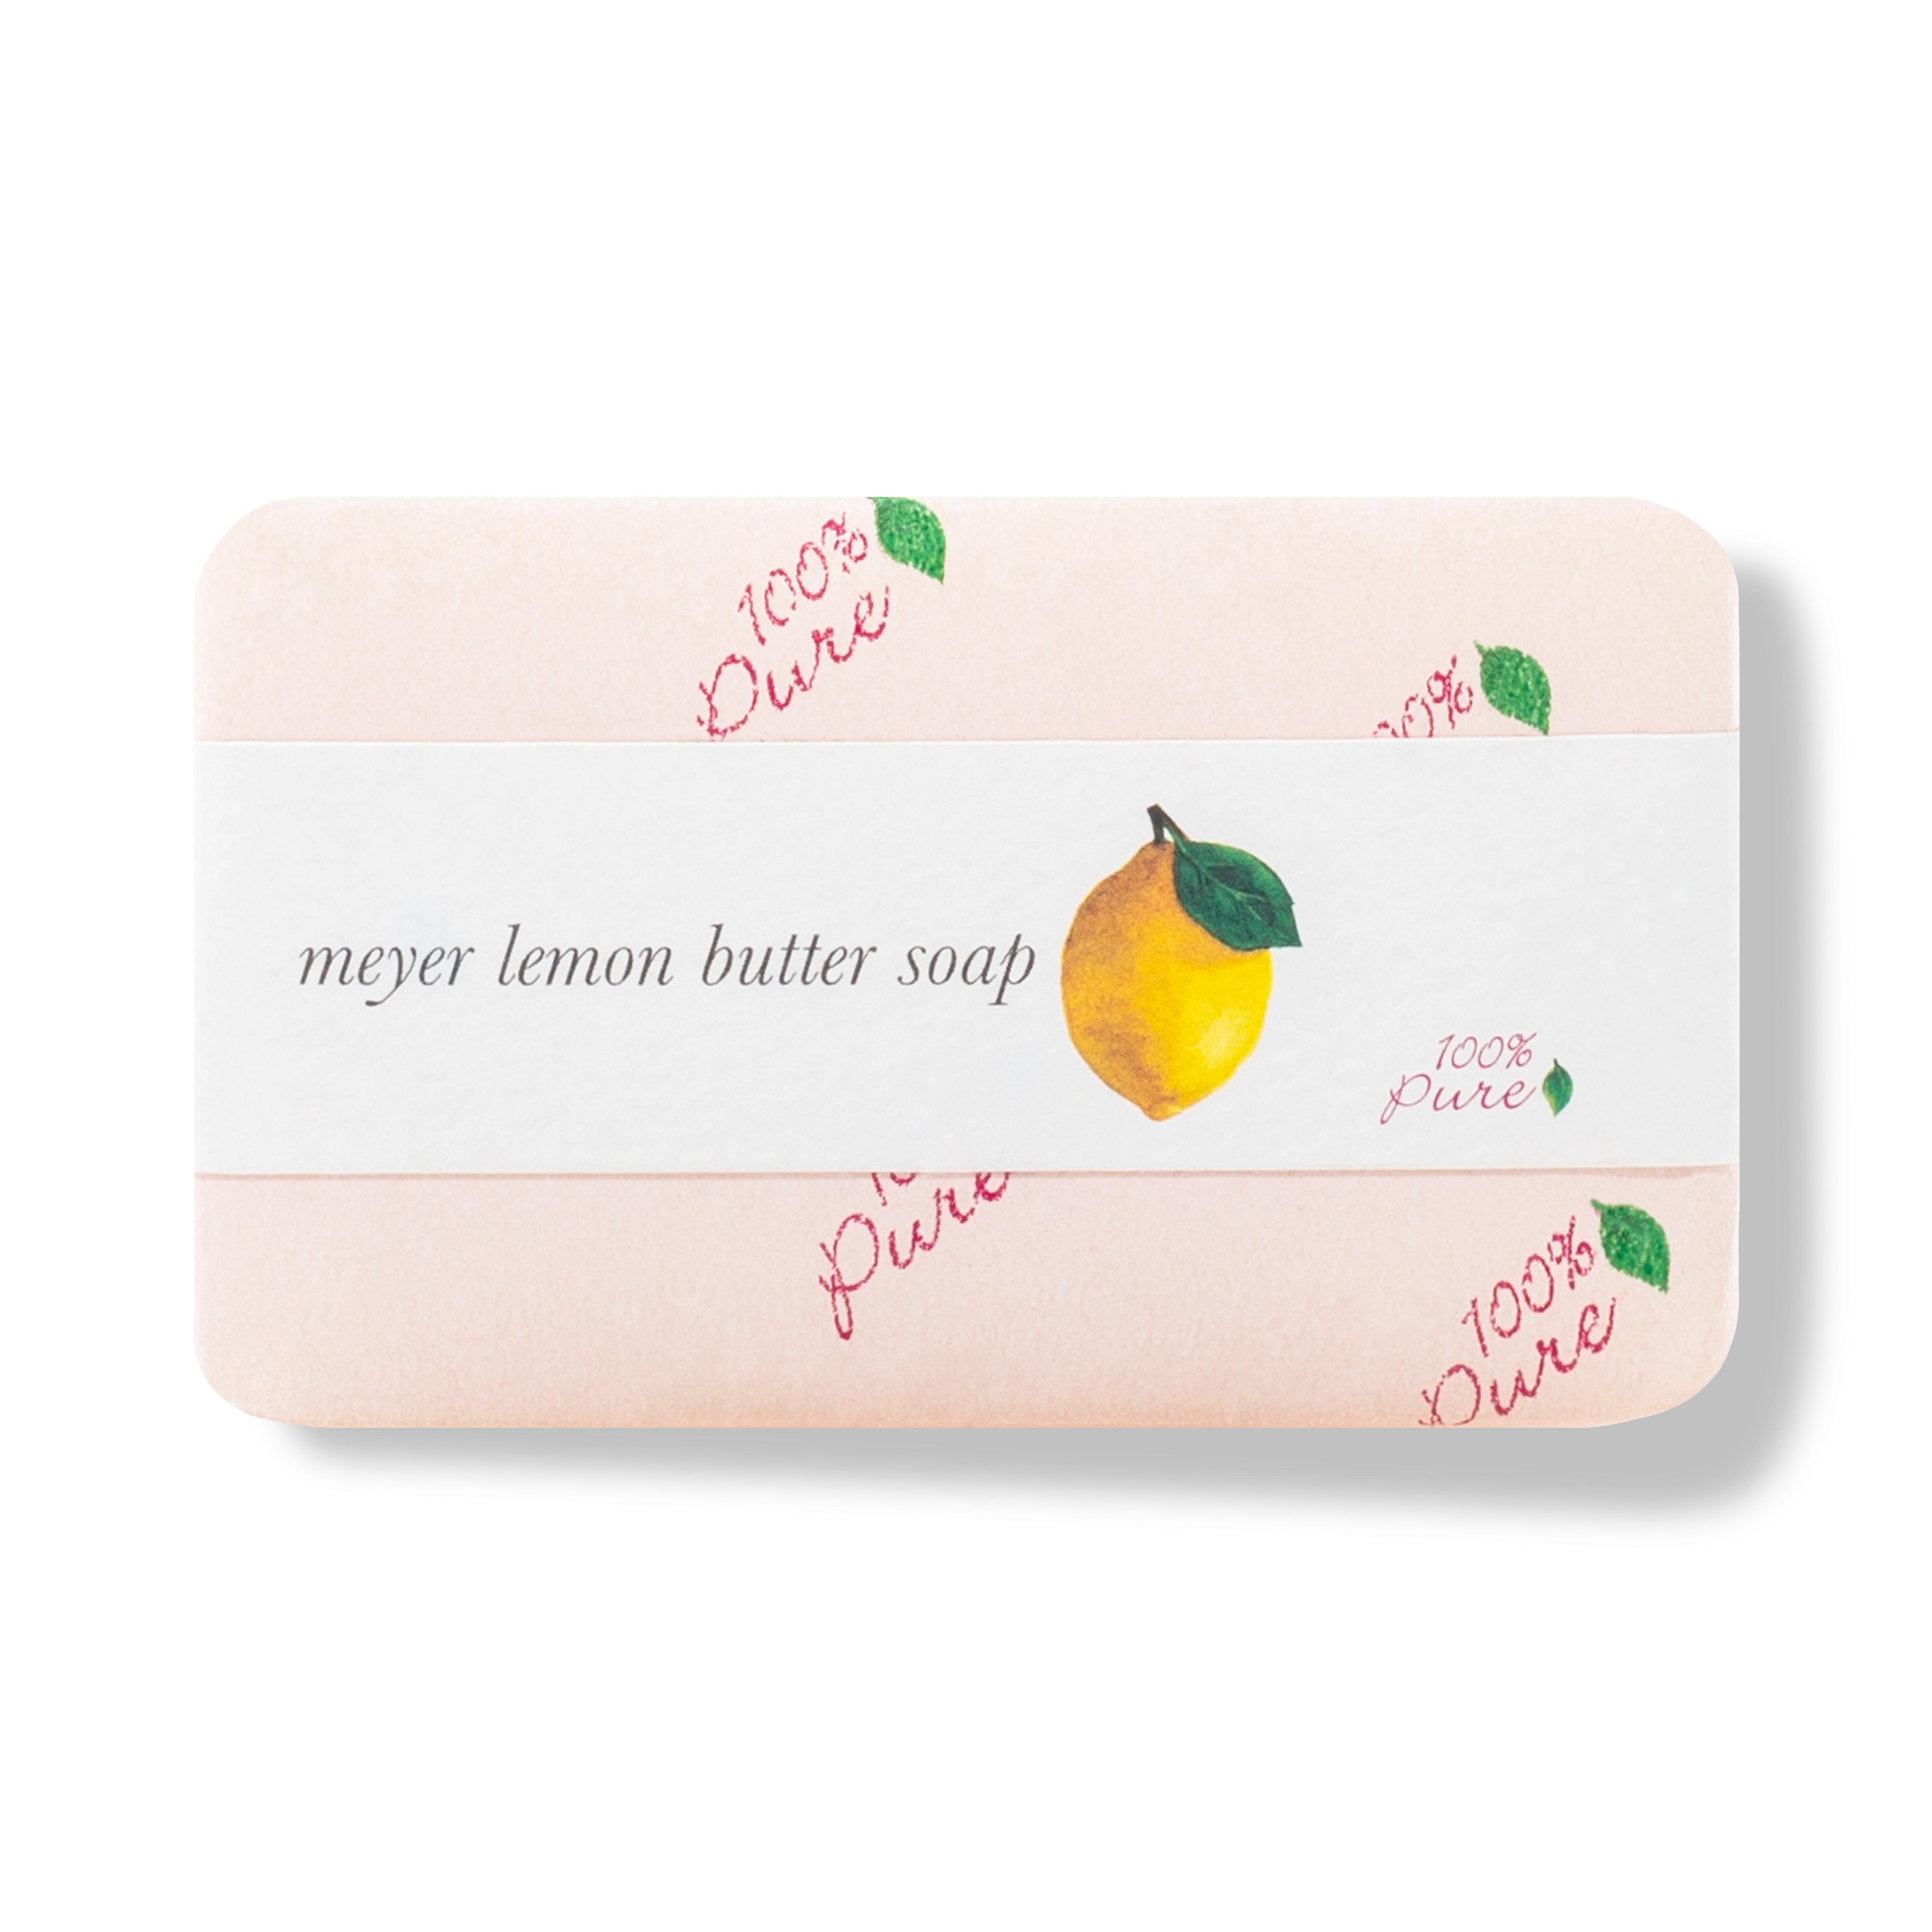 animal cruelty free product image - Meyer Lemon Butter Soap